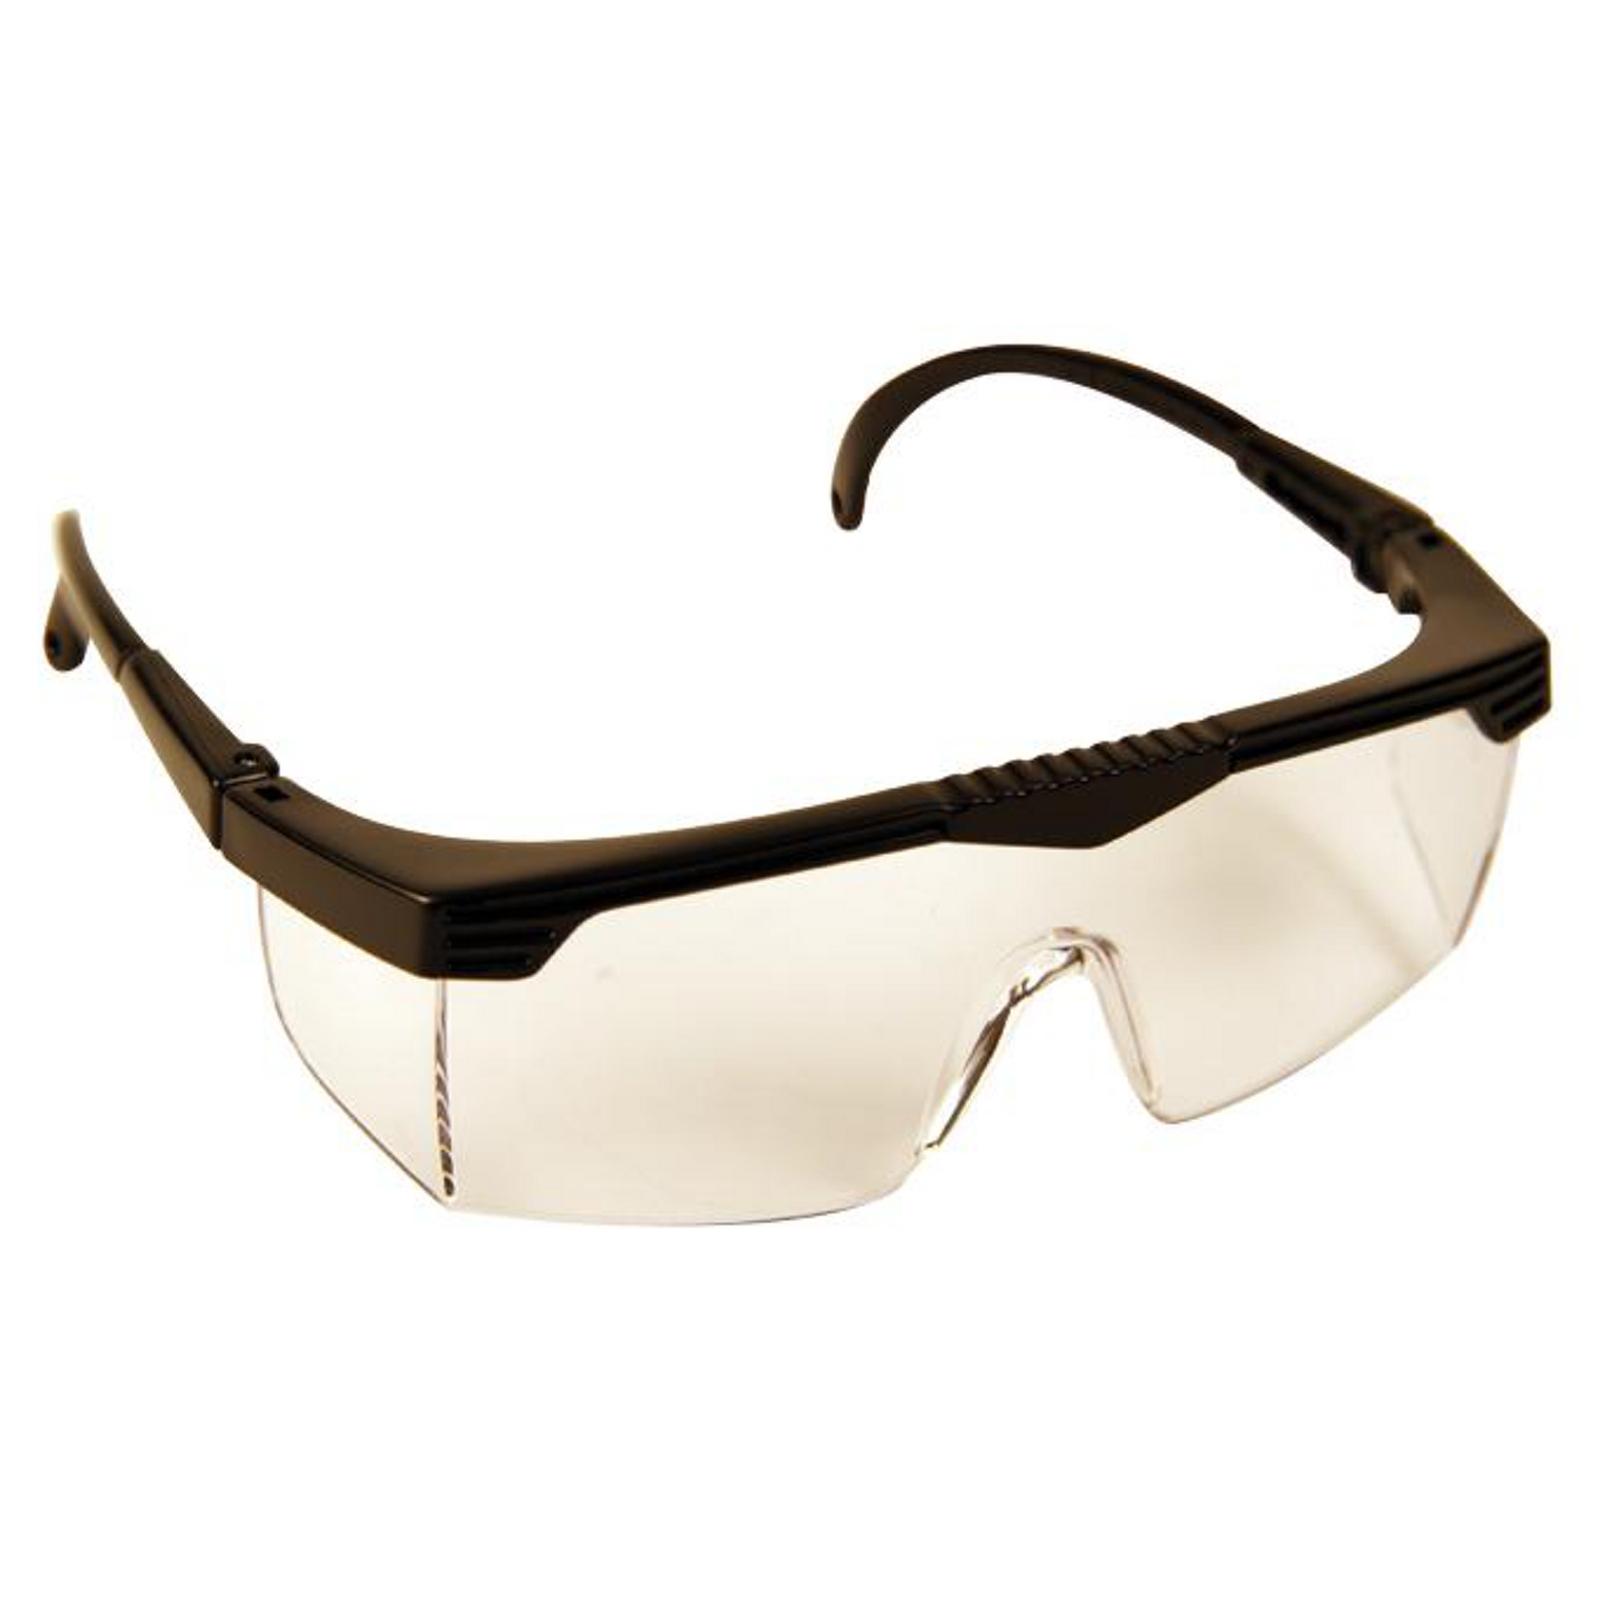 Junior Wraparound Safety Glasses